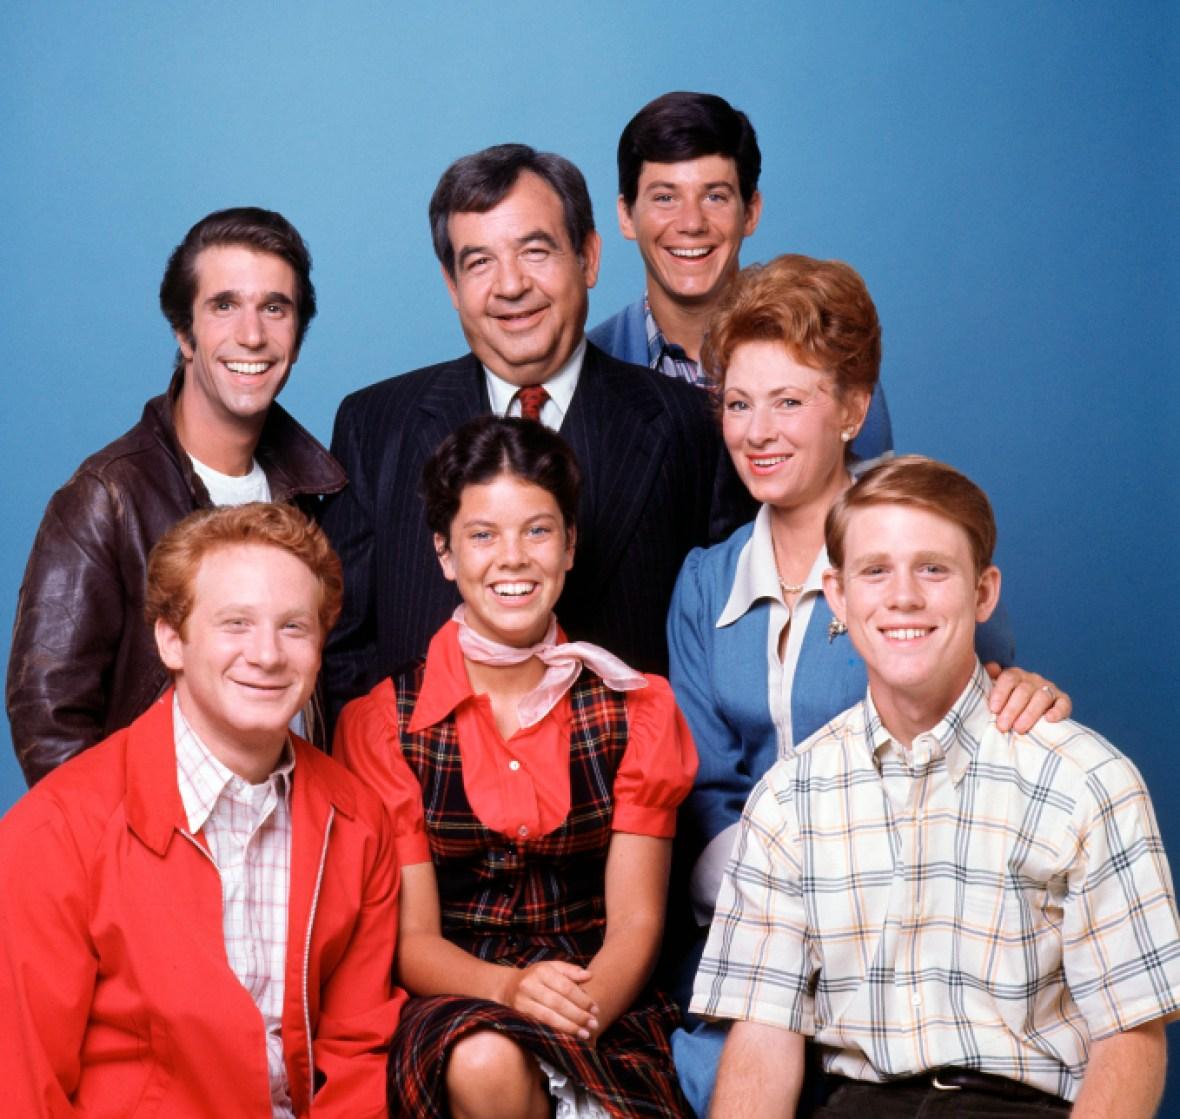 'happy days' cast